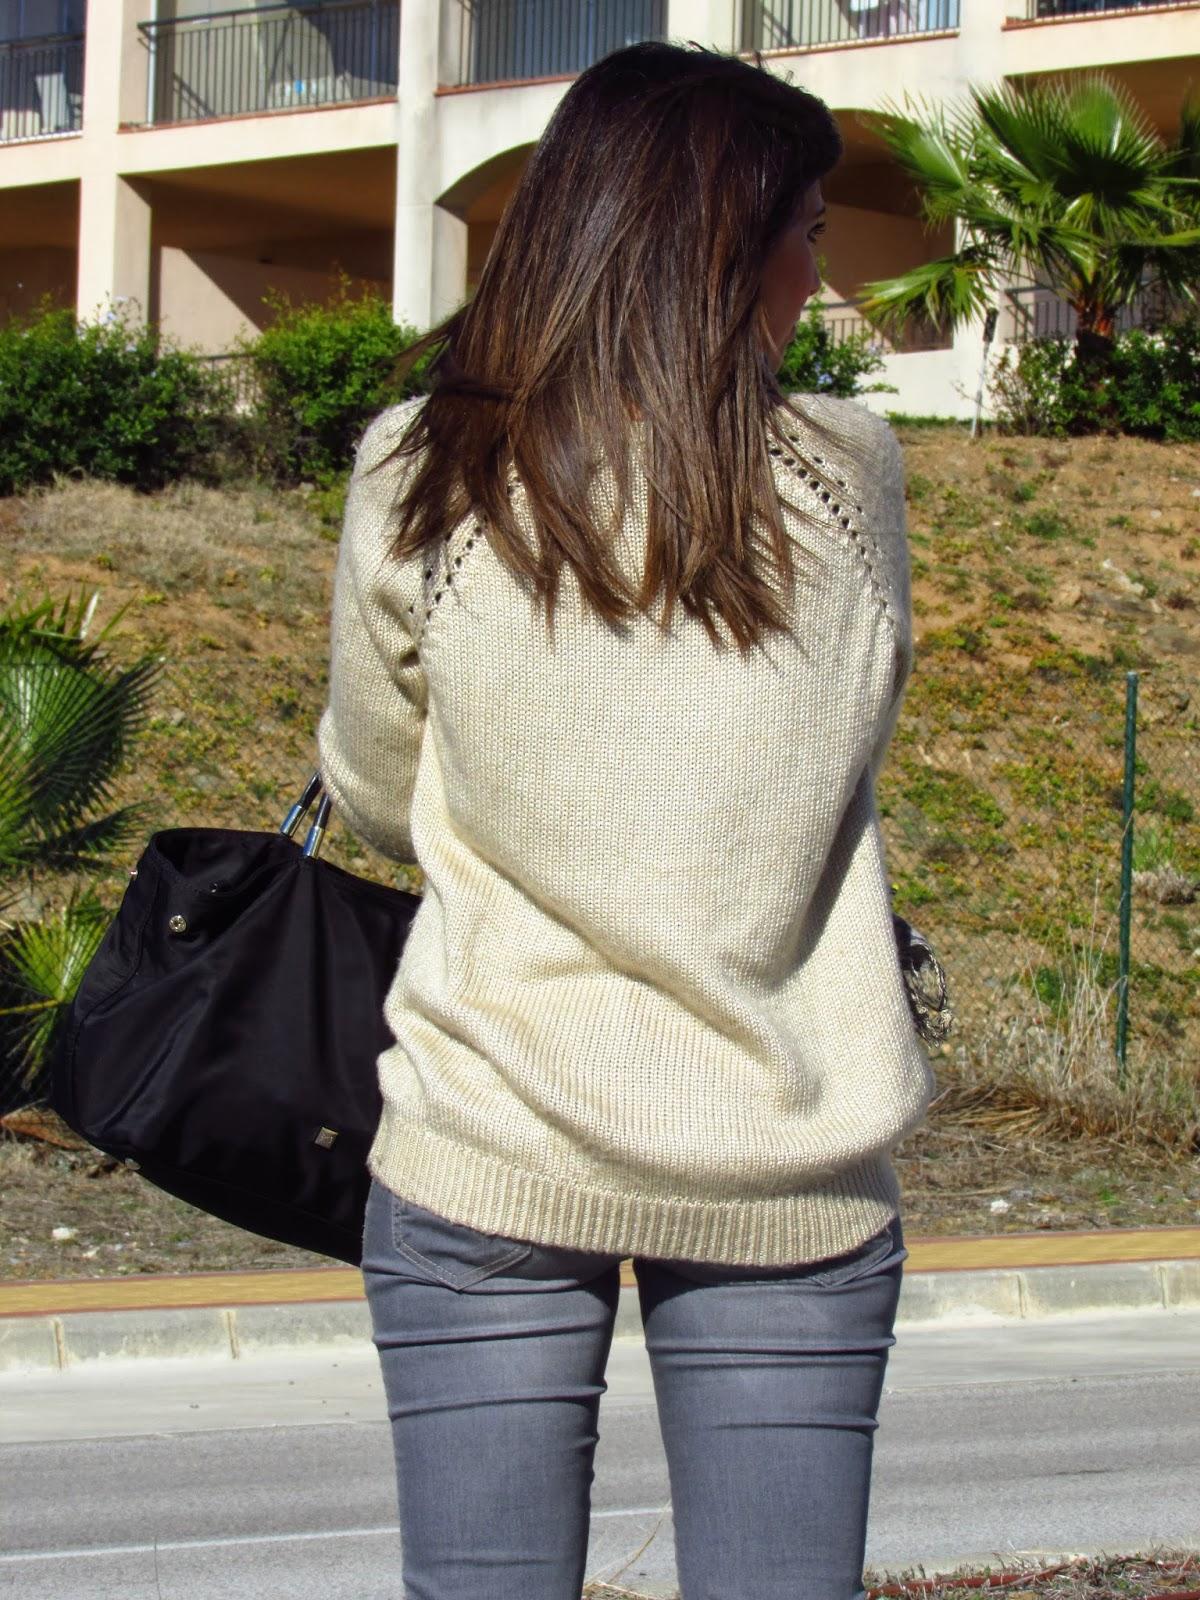 cristina style ootd fashion blogger malagueña inspiration outfit look tendencias moda